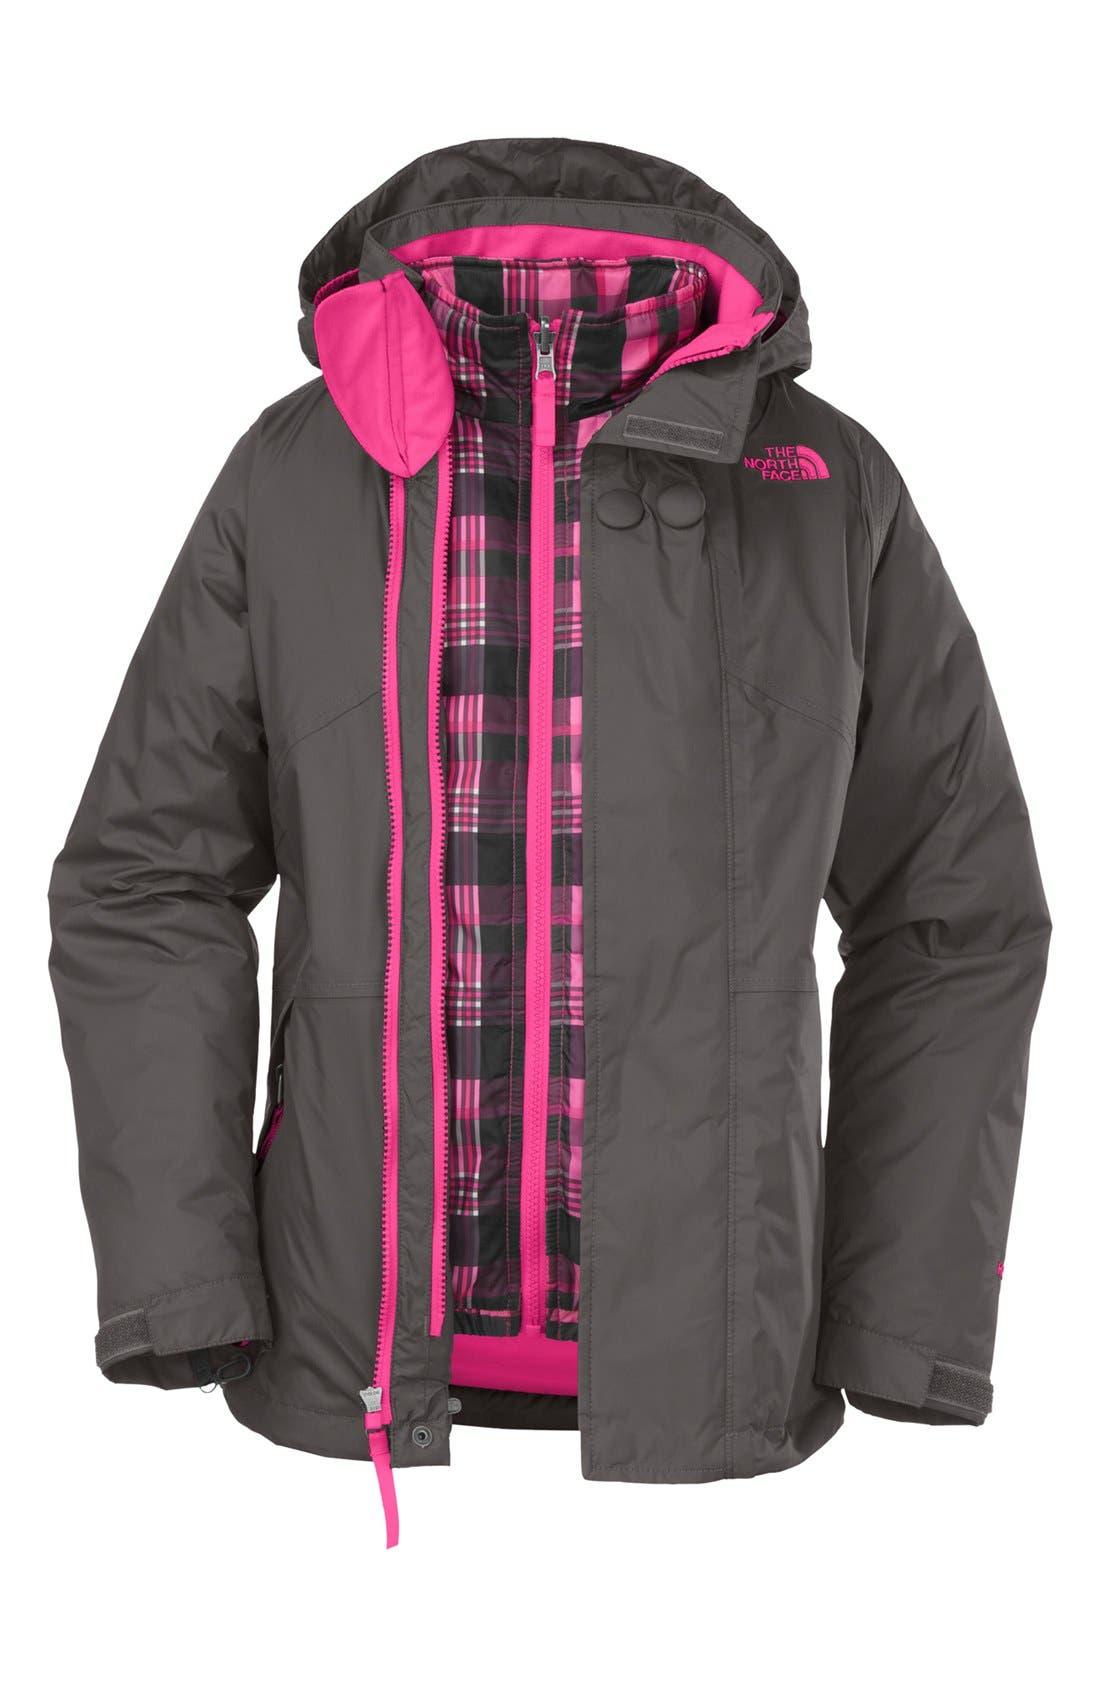 Alternate Image 1 Selected - The North Face 'Maraboo Triclimate®' Waterproof Heatseeker™ Aero Snow Sport Jacket (Little Girls & Big Girls)